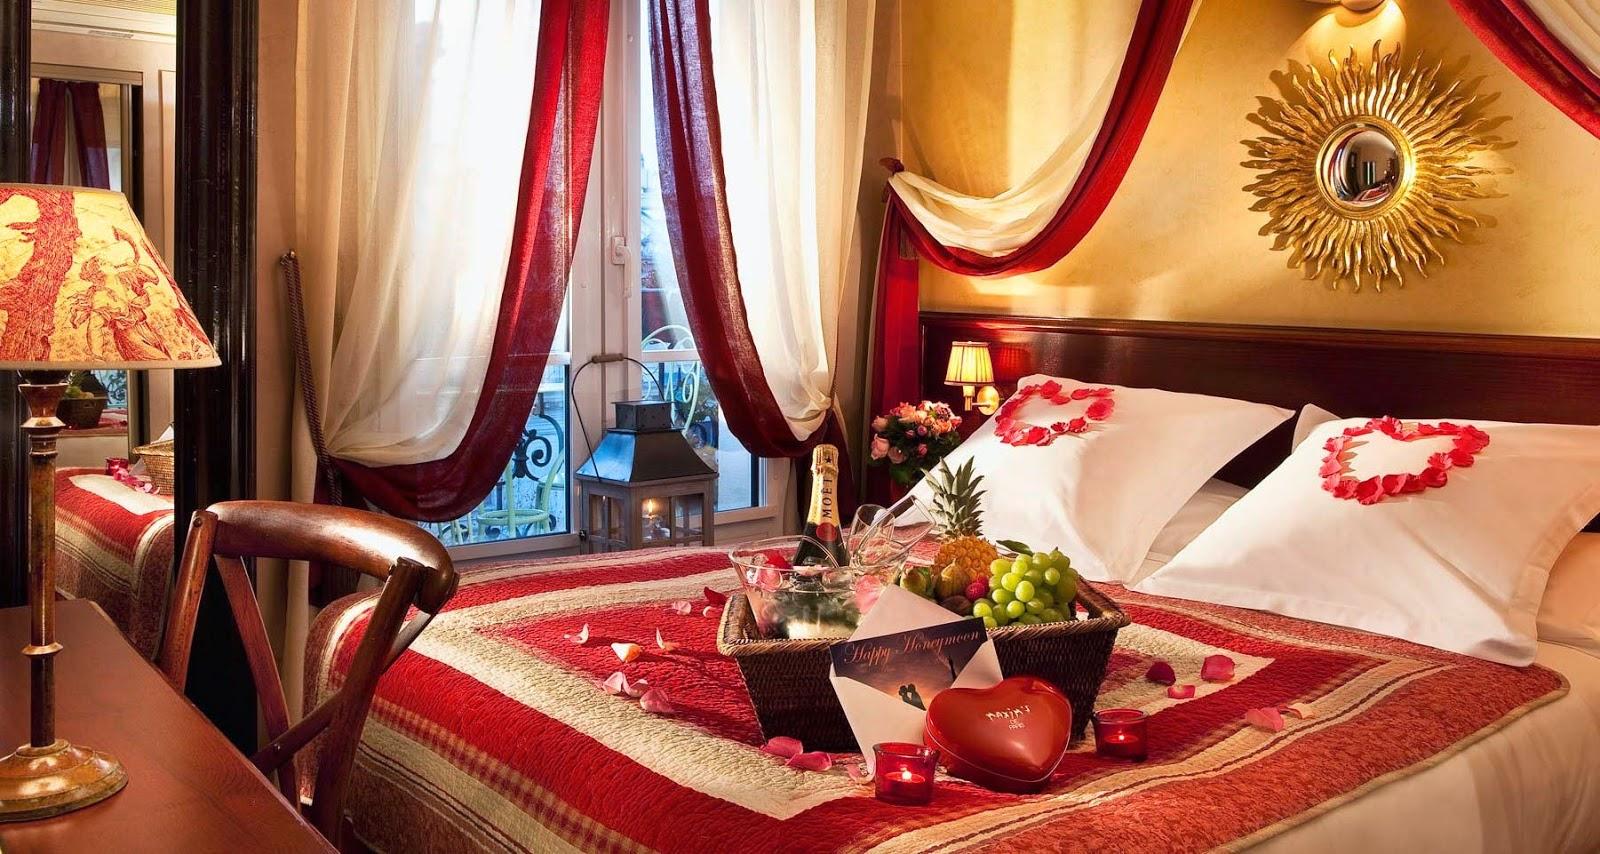 Foundation Dezin & Decor...: Romantic Bedroom Settings